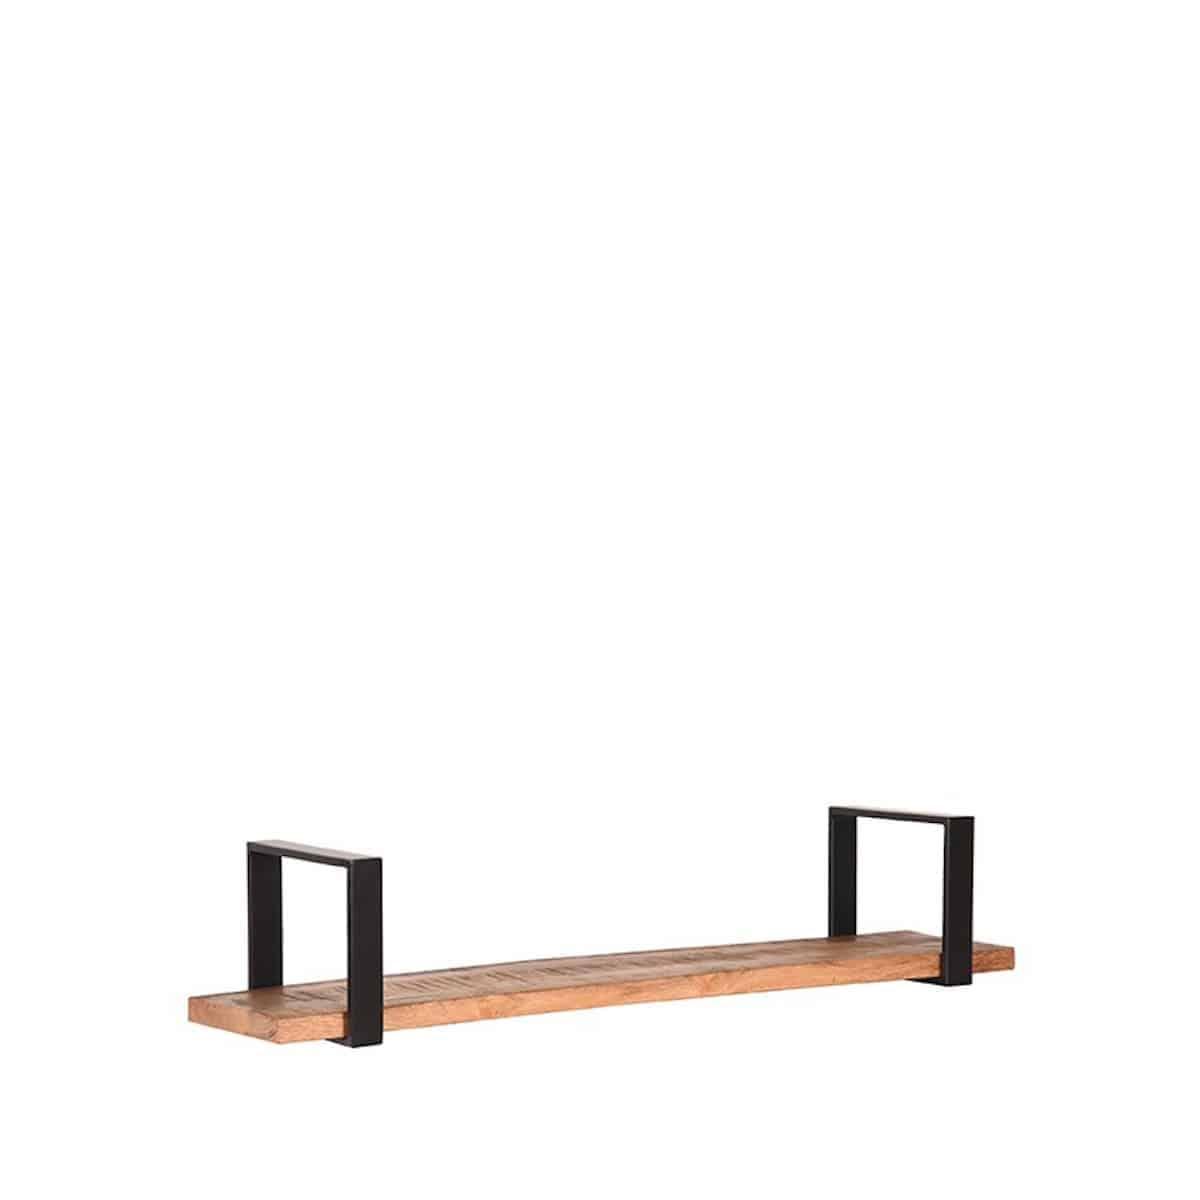 Wandplank Zwart Metaal.Industriele Wandplank Label51 Slam Mango Hout Metaal Zwart